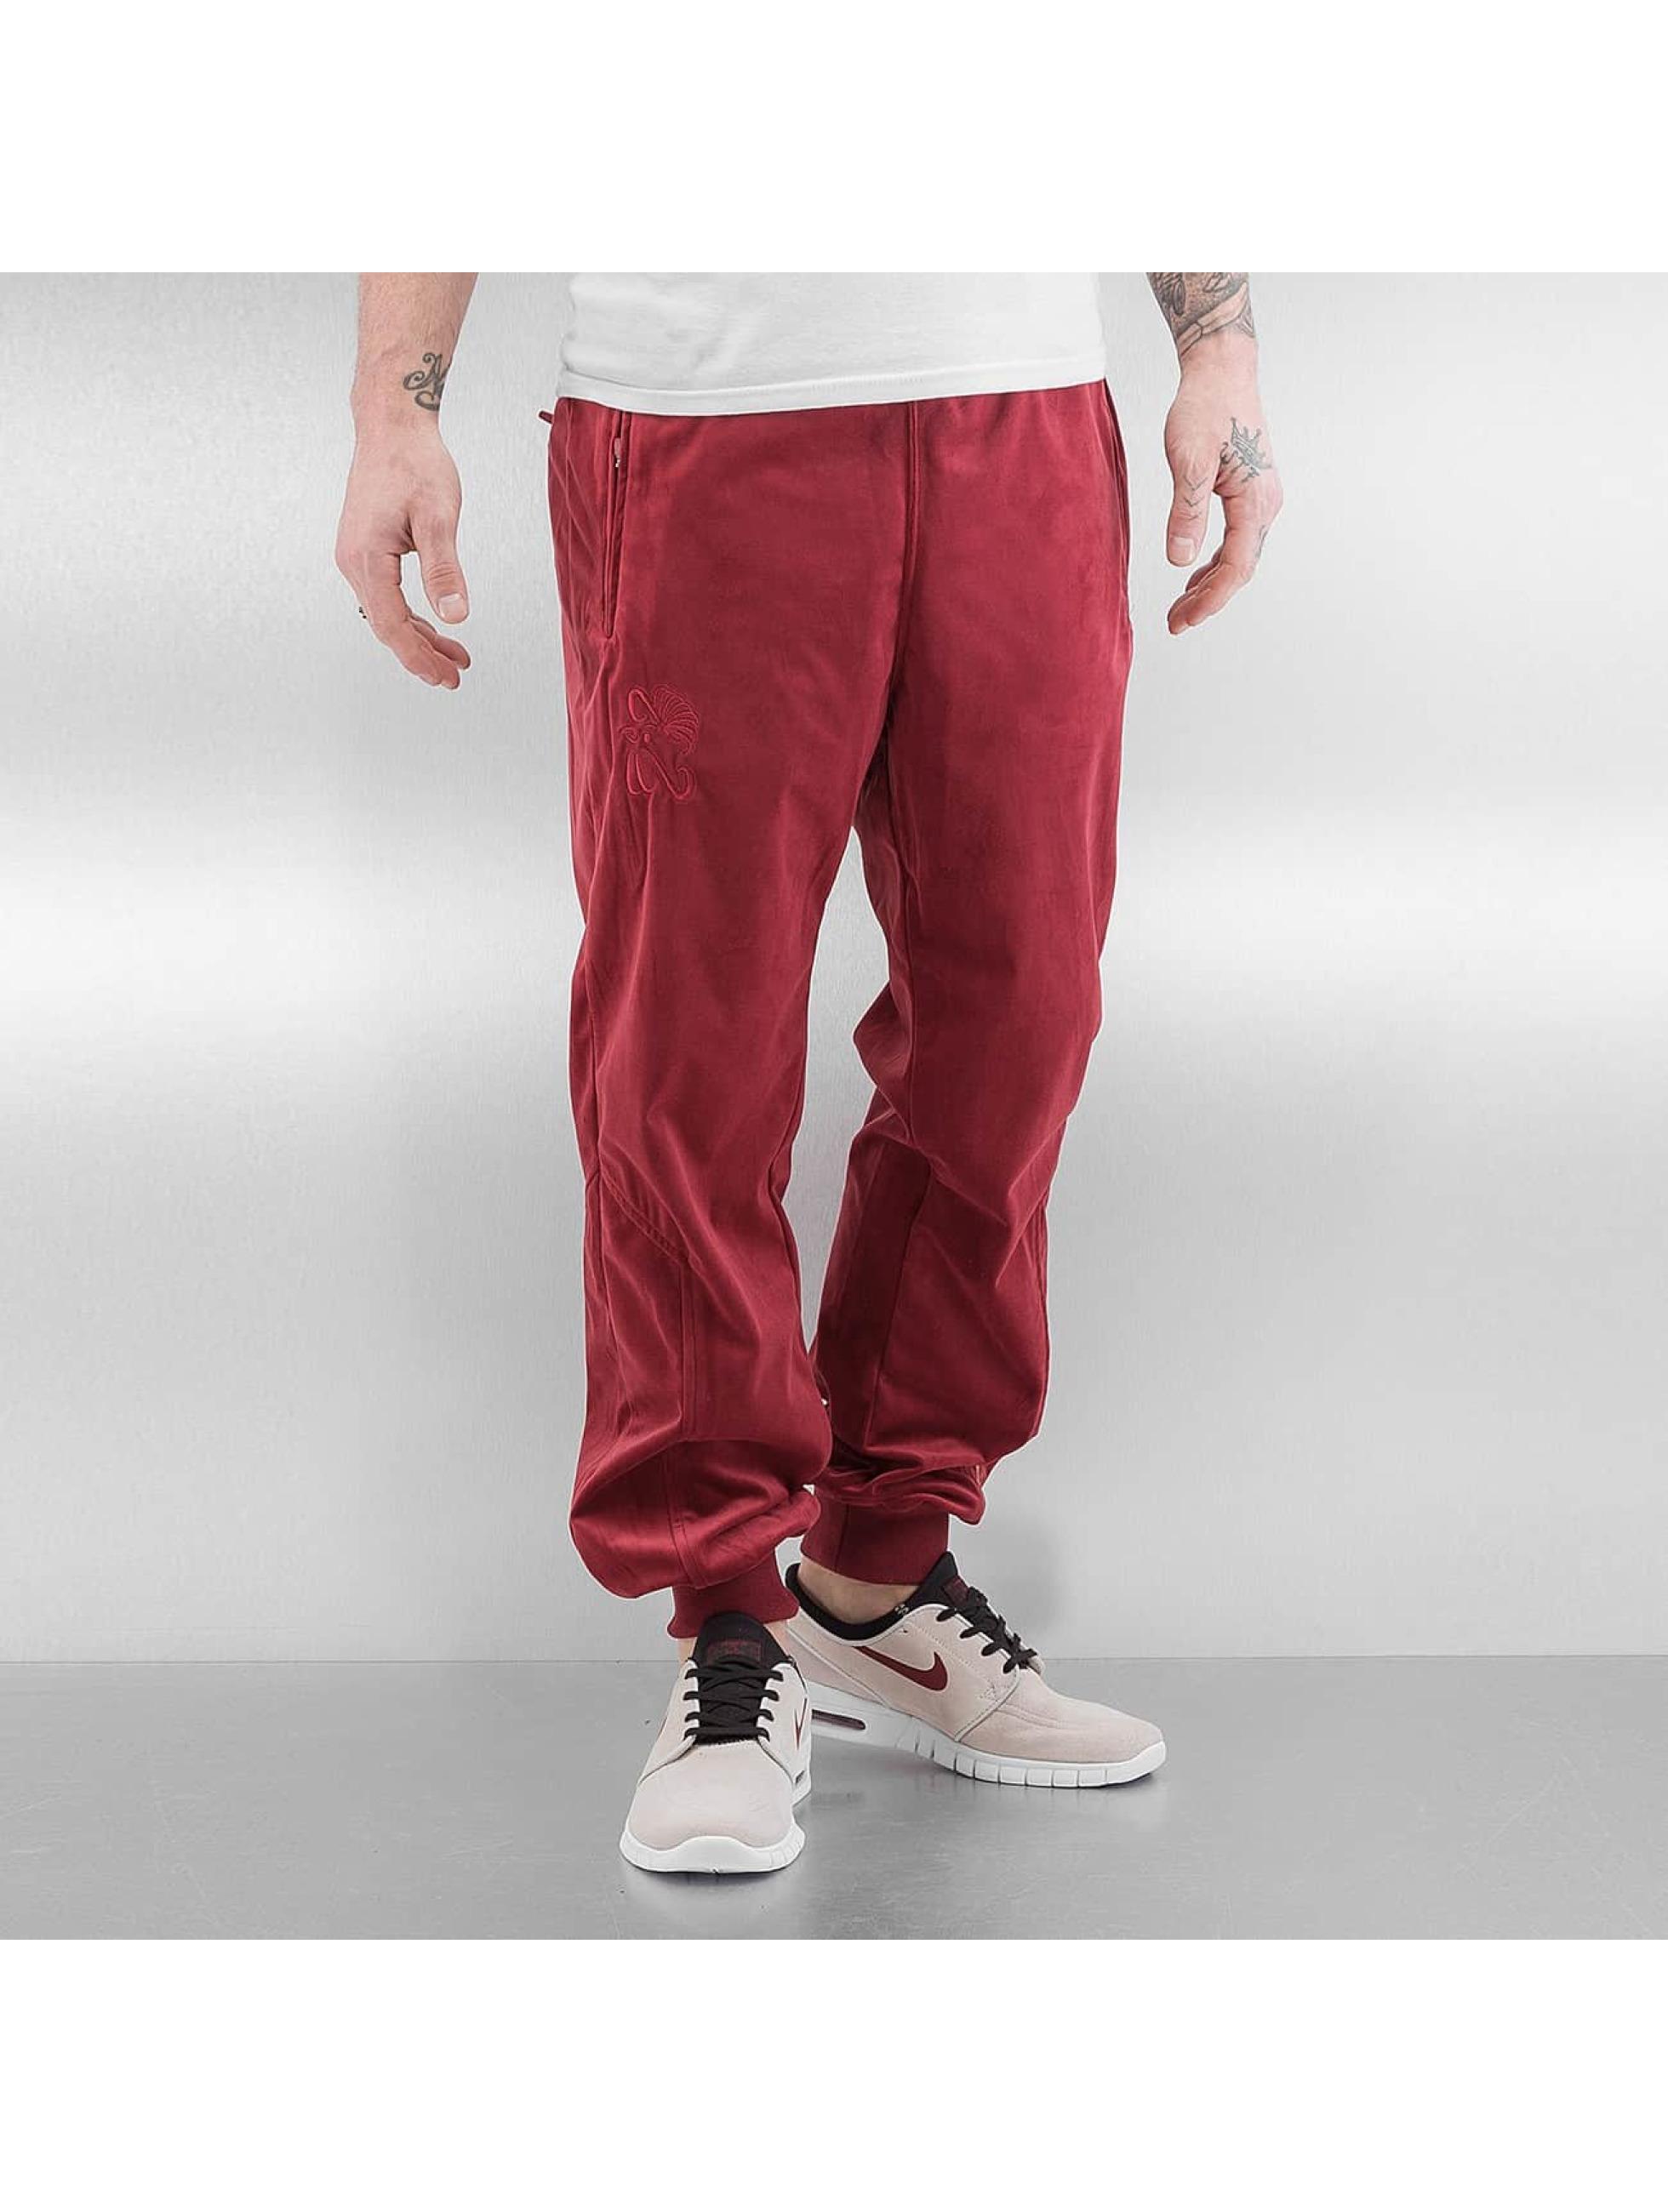 CHABOS IIVII Pantalón deportivo Core Velour Samt rojo